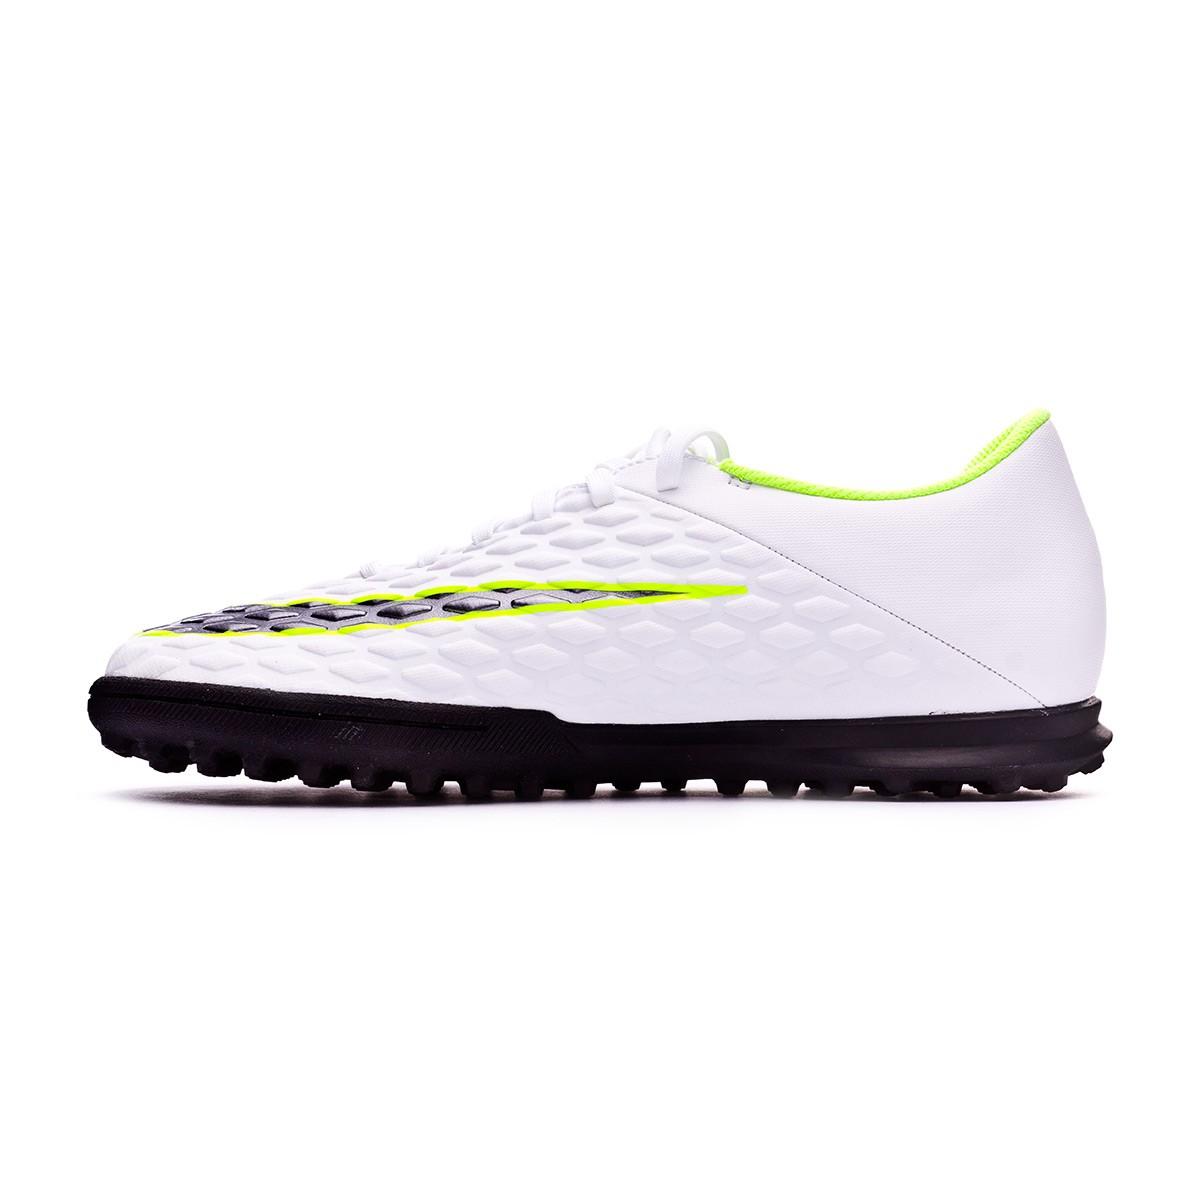 ad16a754d Football Boot Nike Hypervenom PhantomX III Club Turf White-Metallic cool  grey-Volt-Metallic cool g - Football store Fútbol Emotion